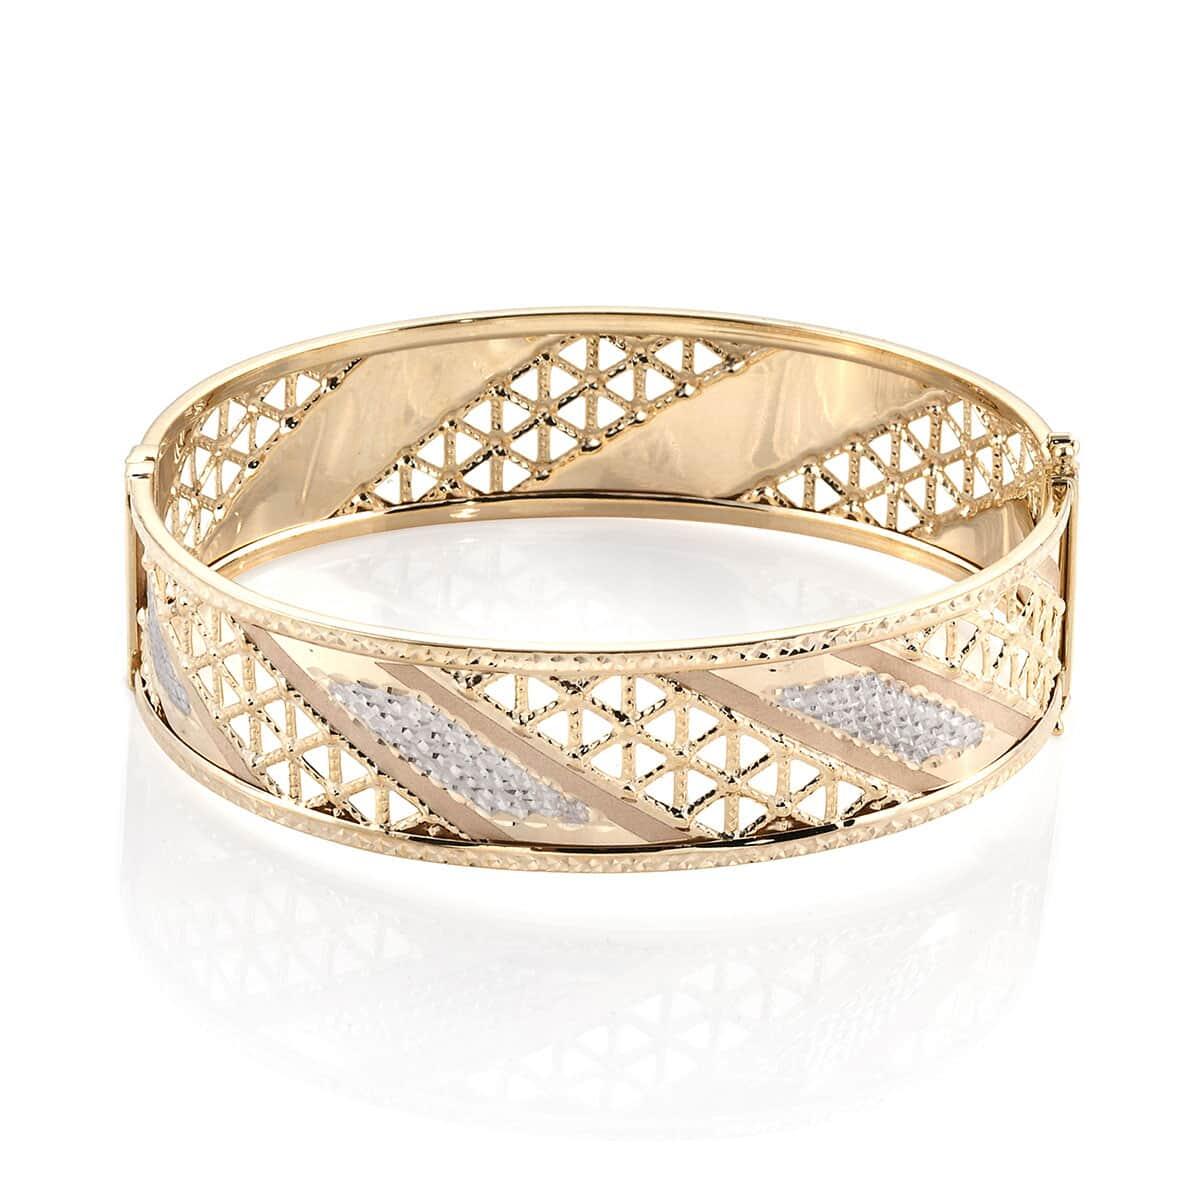 Aurumvita Bangle Bracelet (7.25 in) in 10K White Yellow Gold (12.58 g)